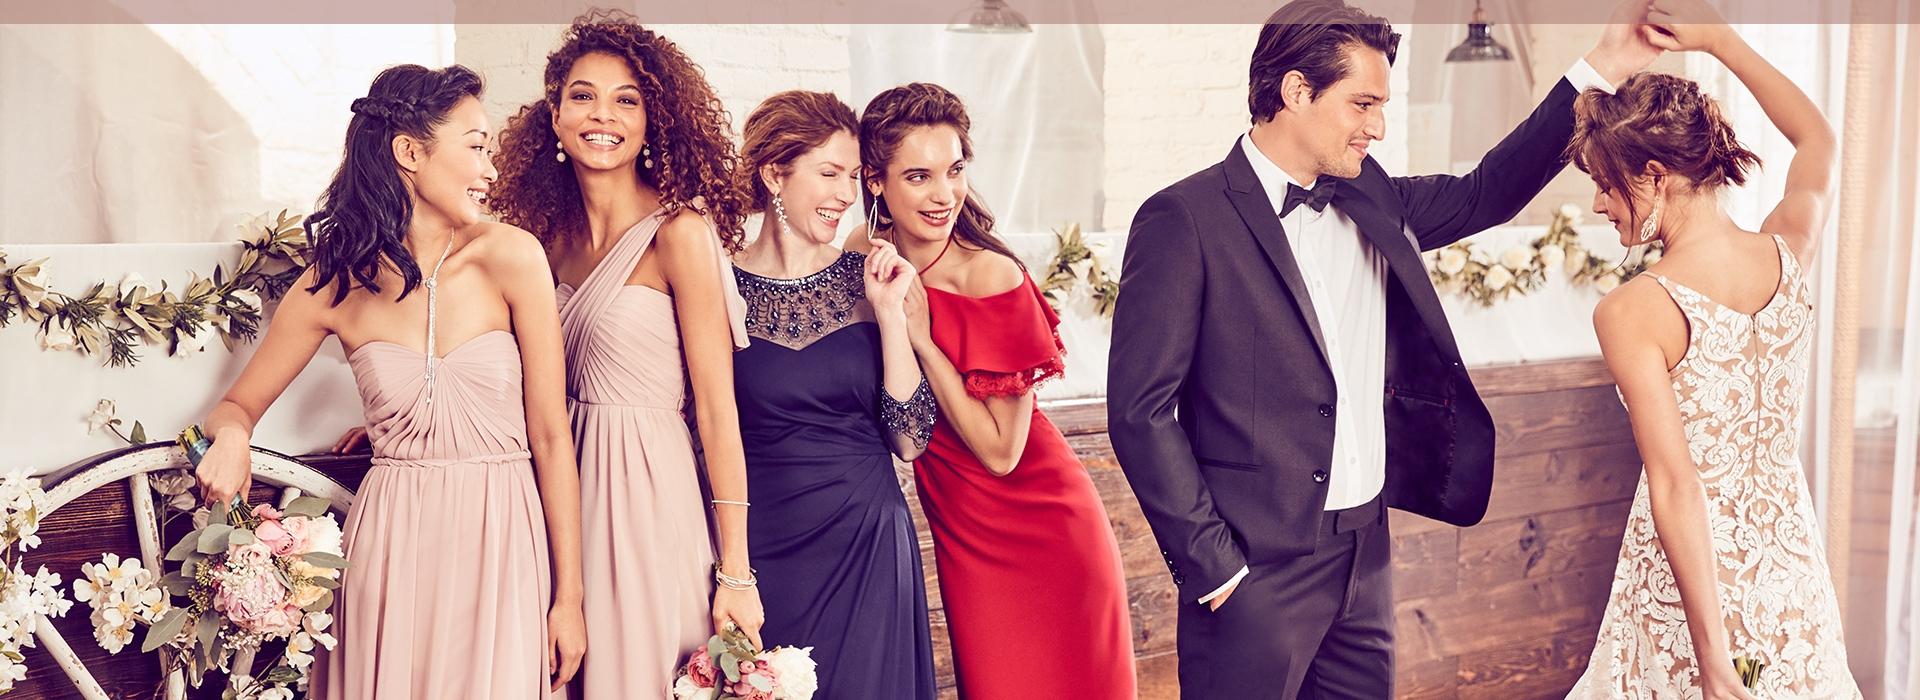 lt-wedding-guide-2018-02-15-header-background?scl=1&fmt=jpeg&qlt=97